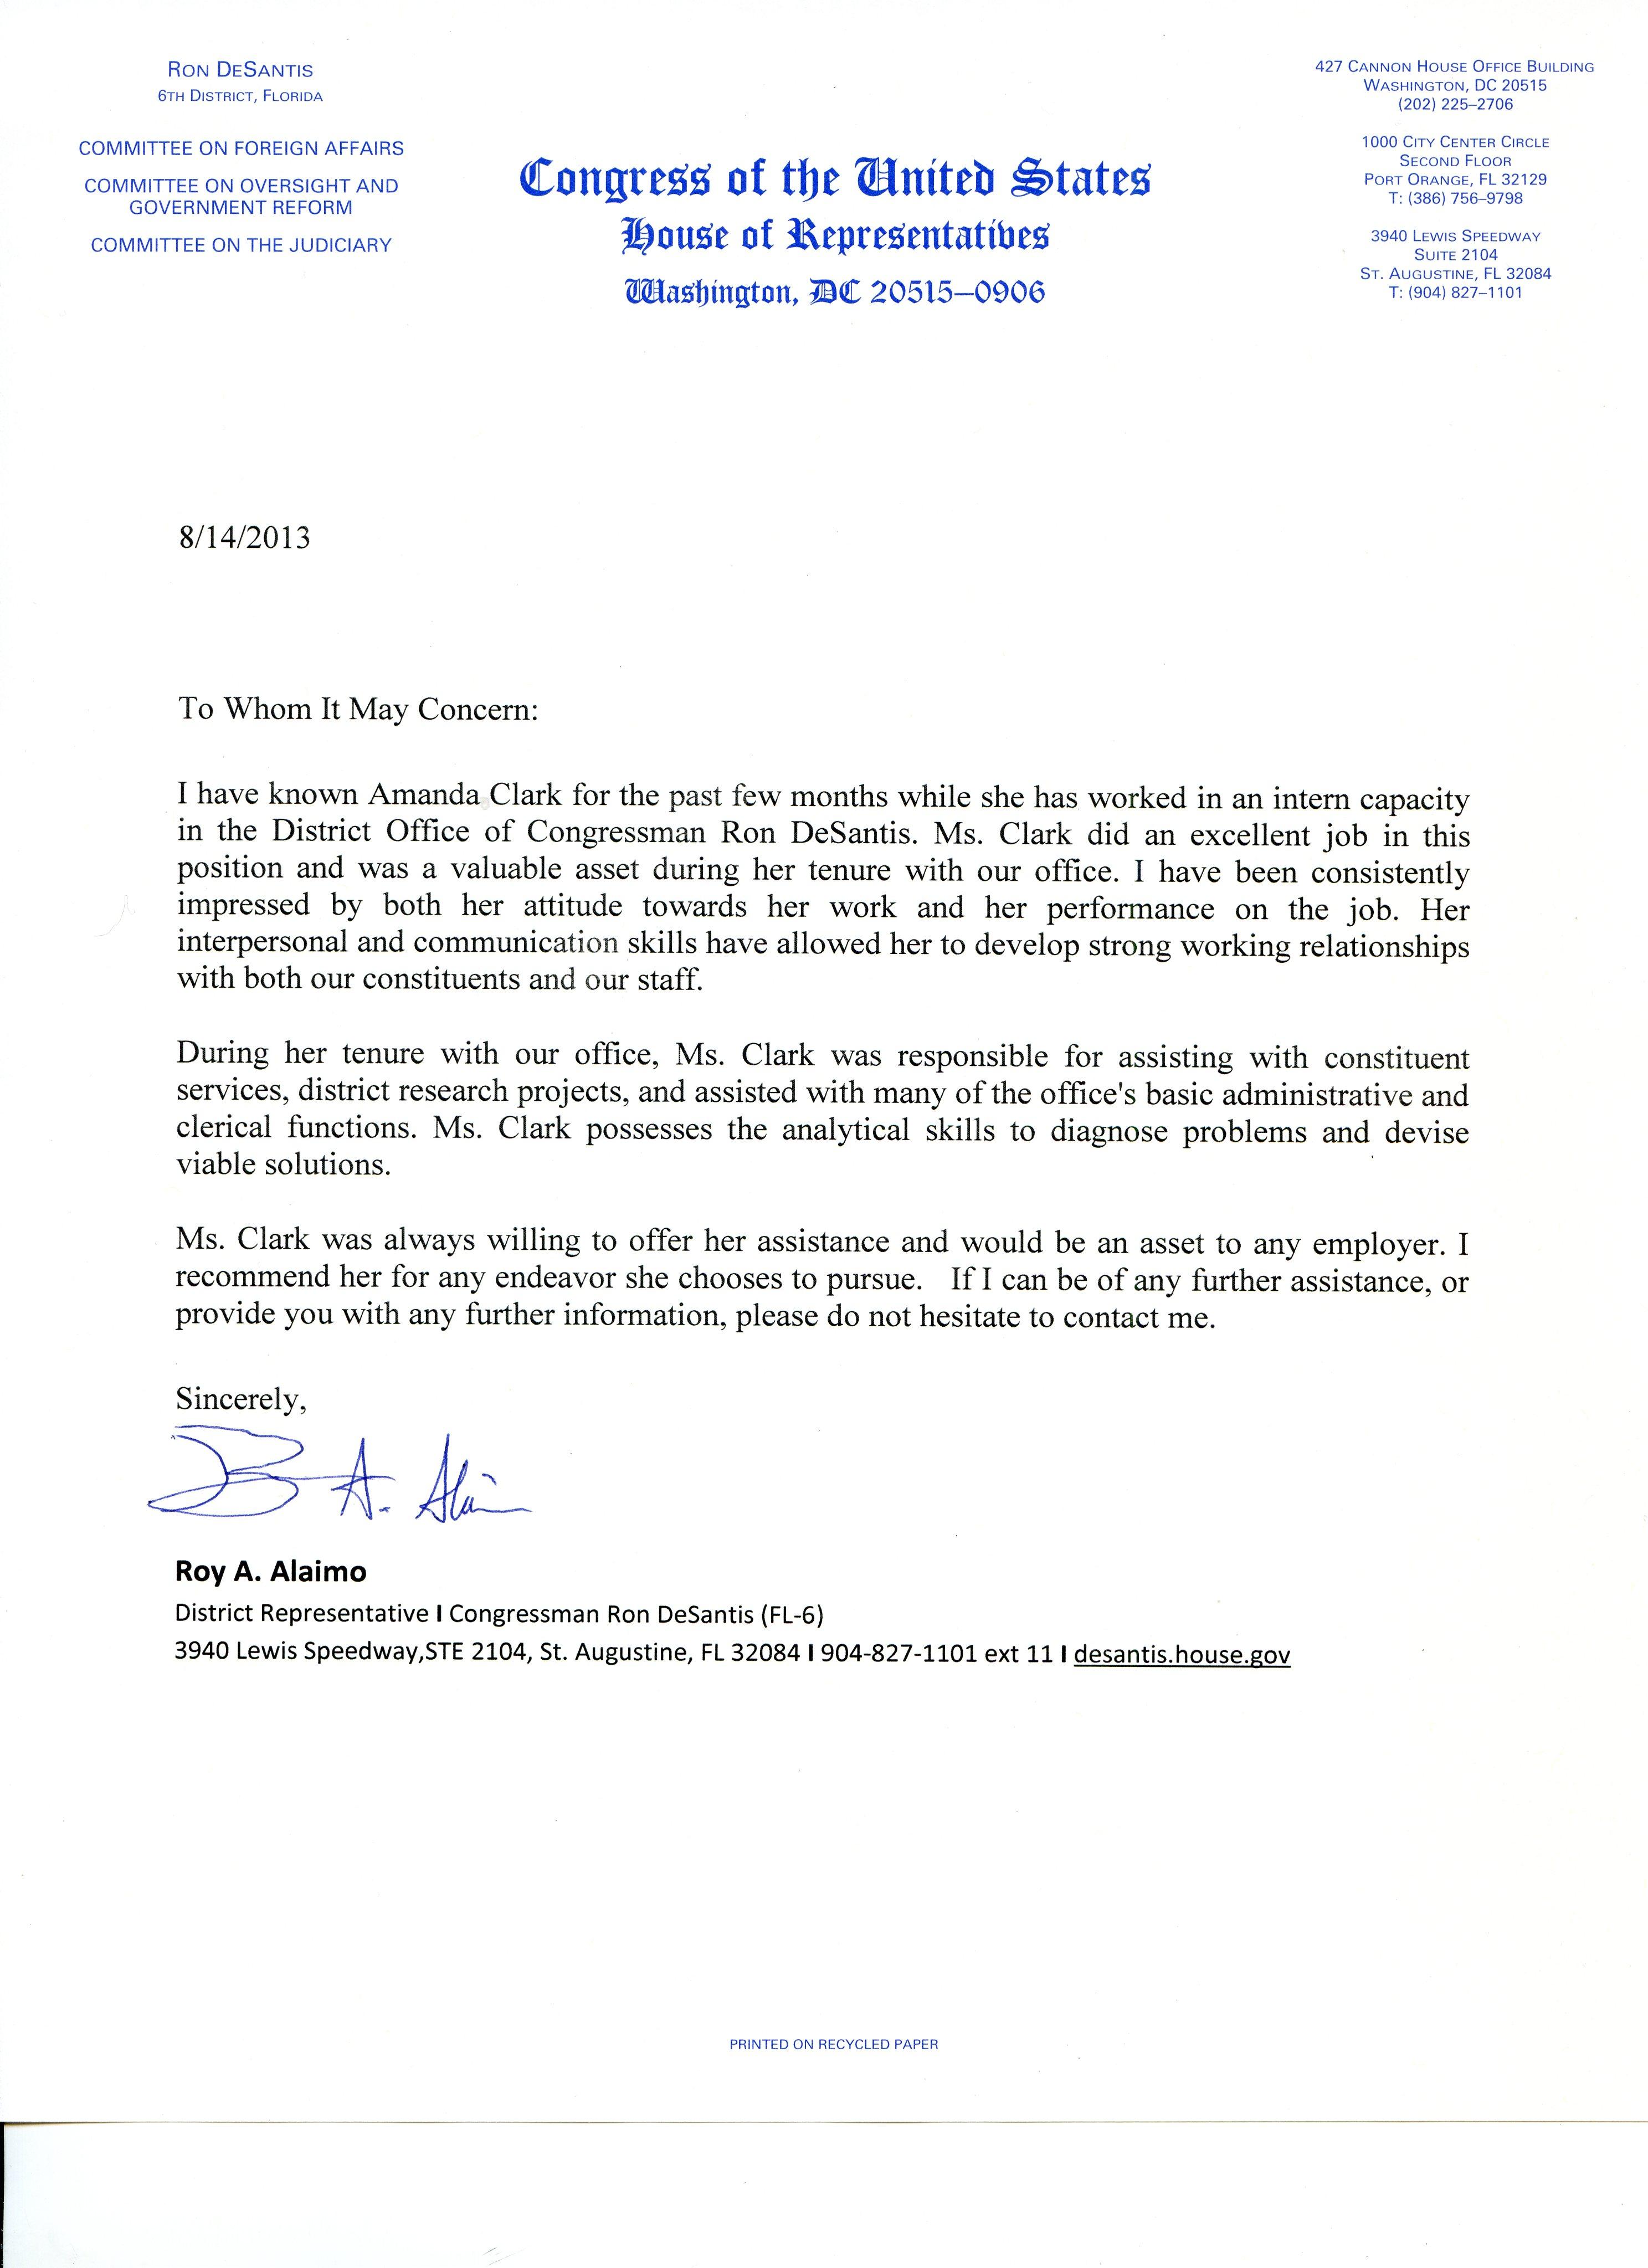 Congressman Ron DeSantis District Office Internship – Letter of Recommendation for Internship